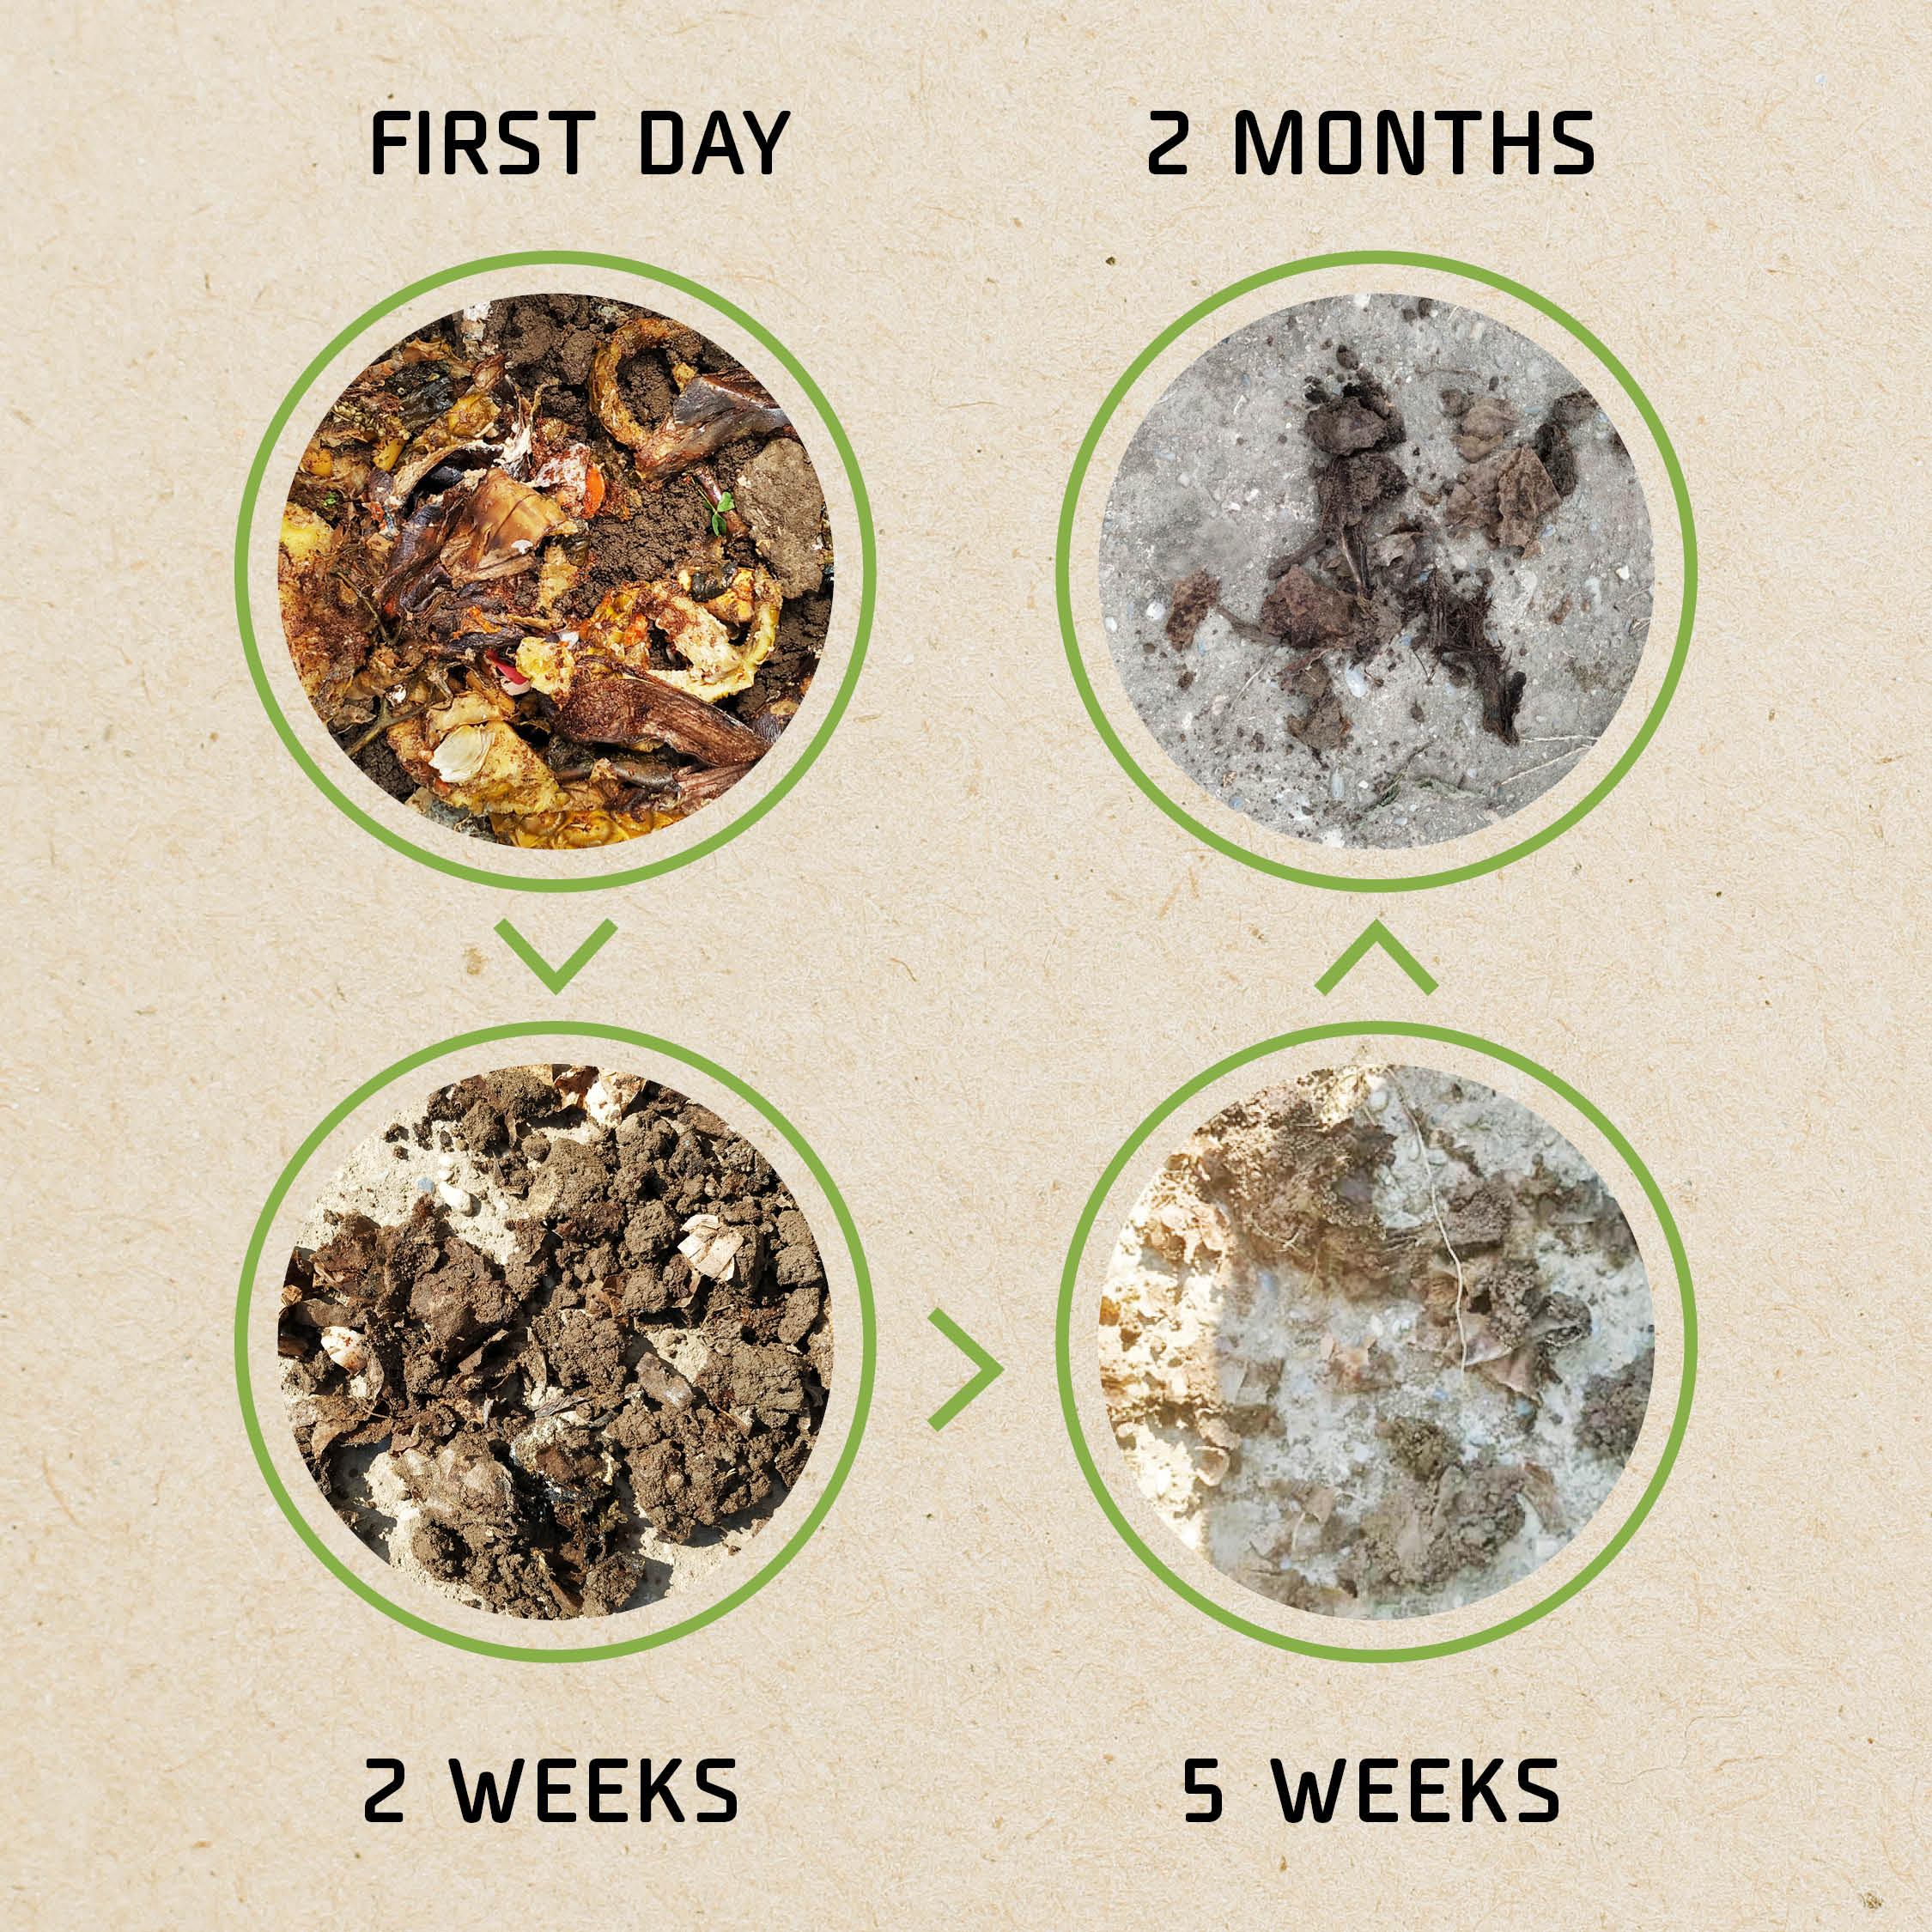 Desomposition of fermented waste